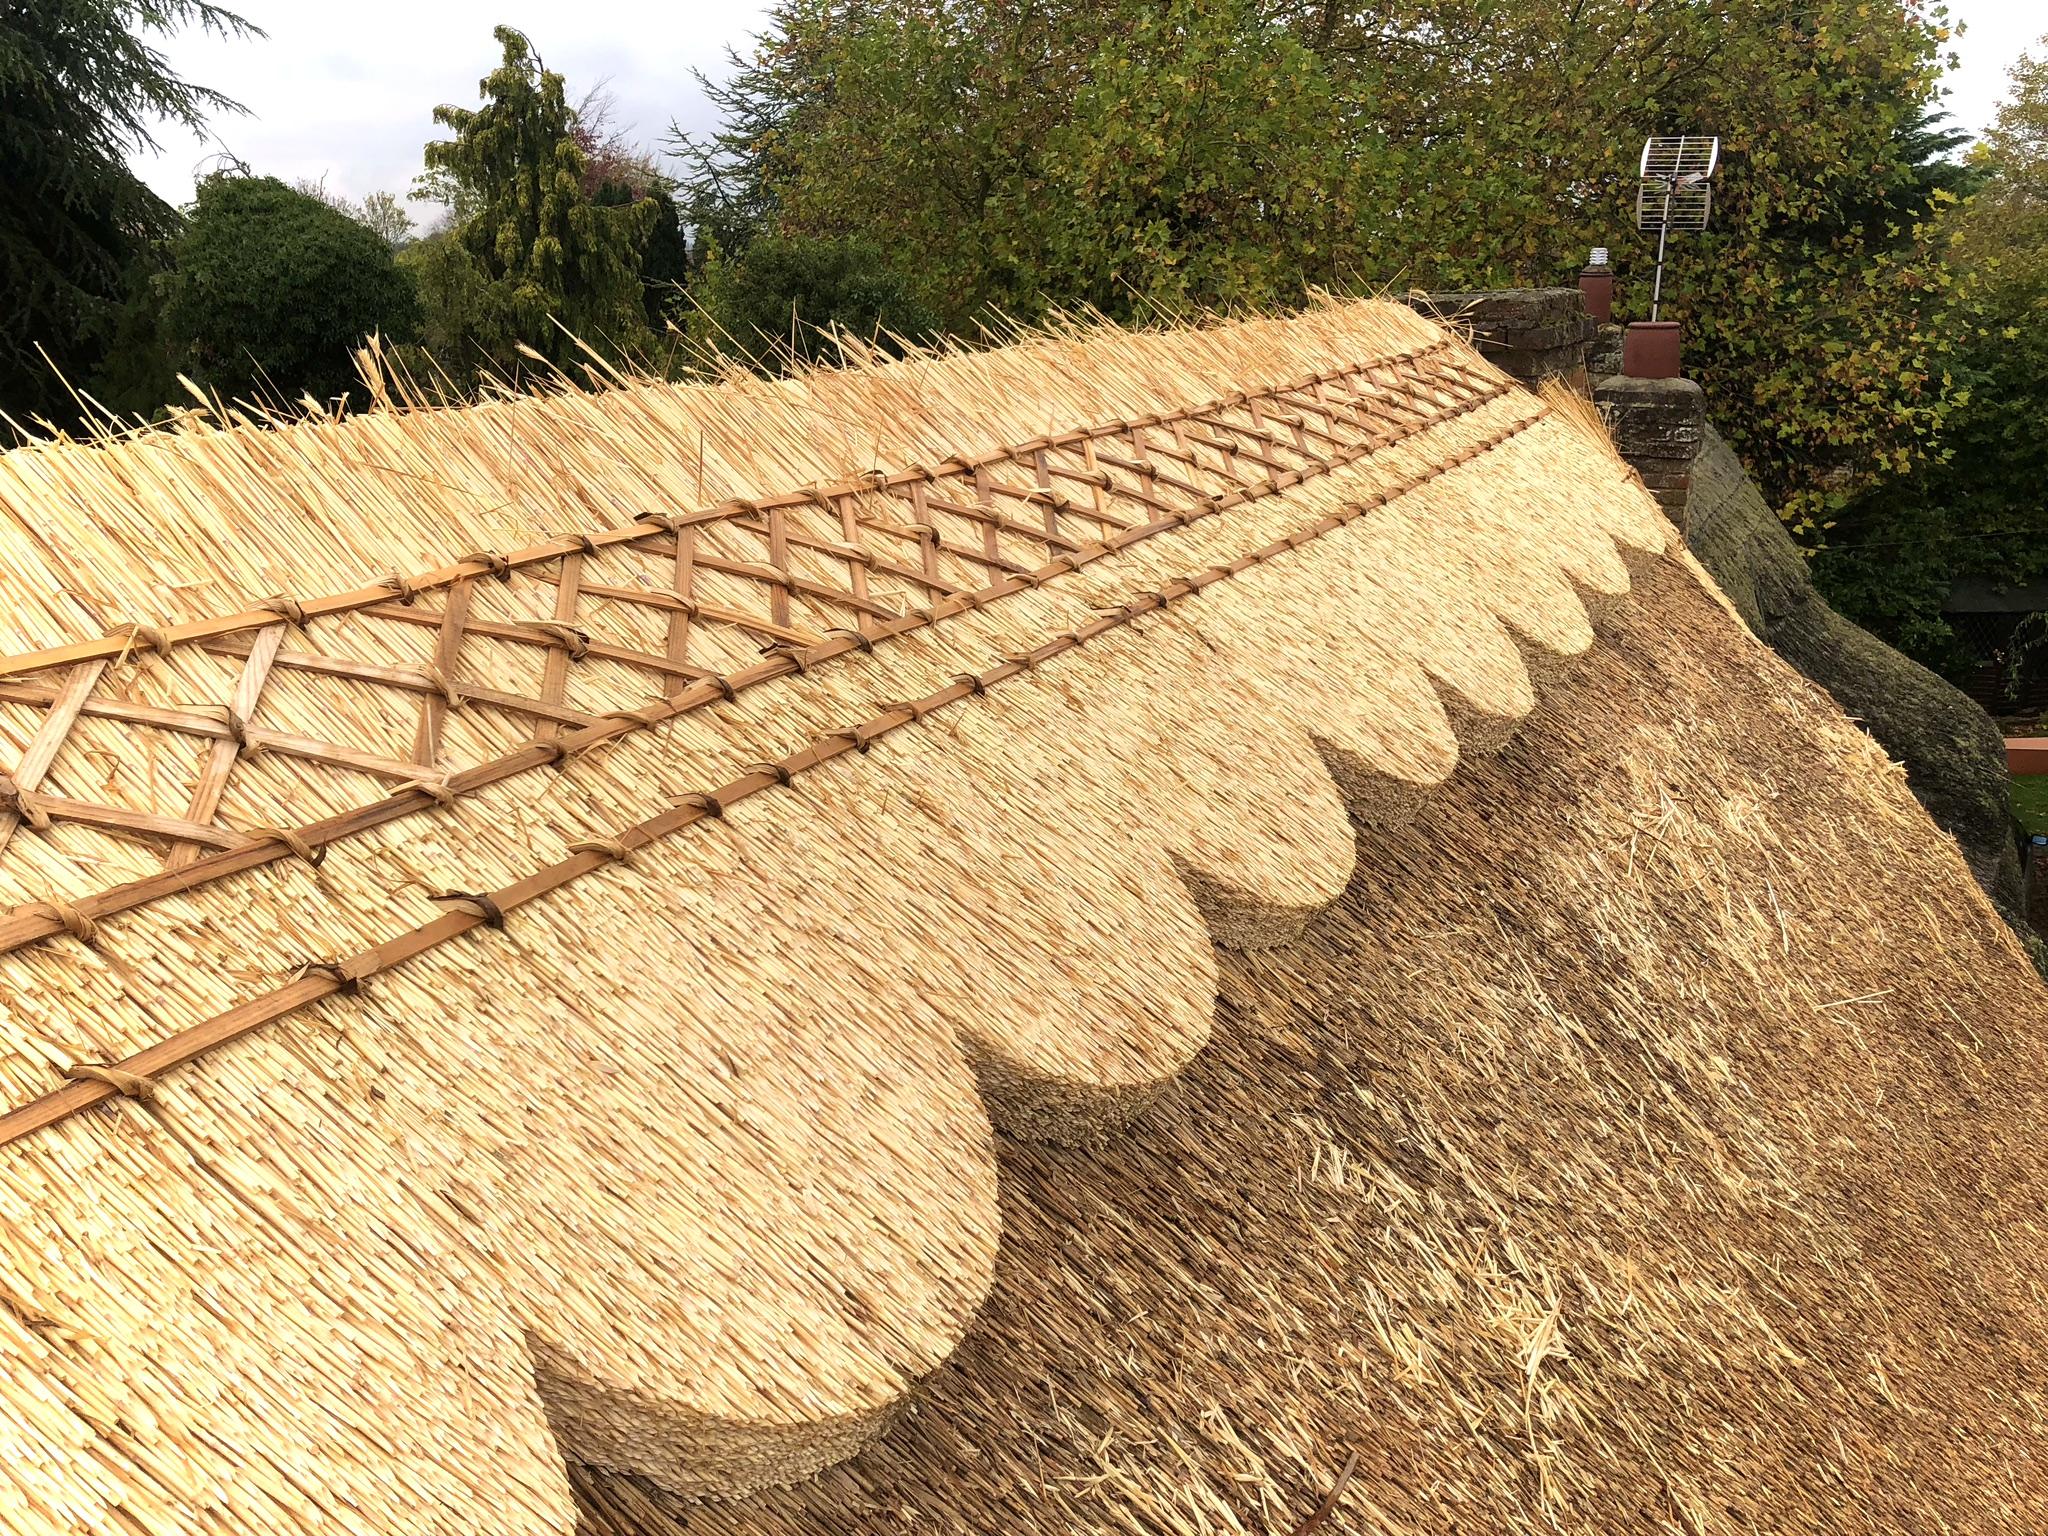 Patterned Thatch Ridge